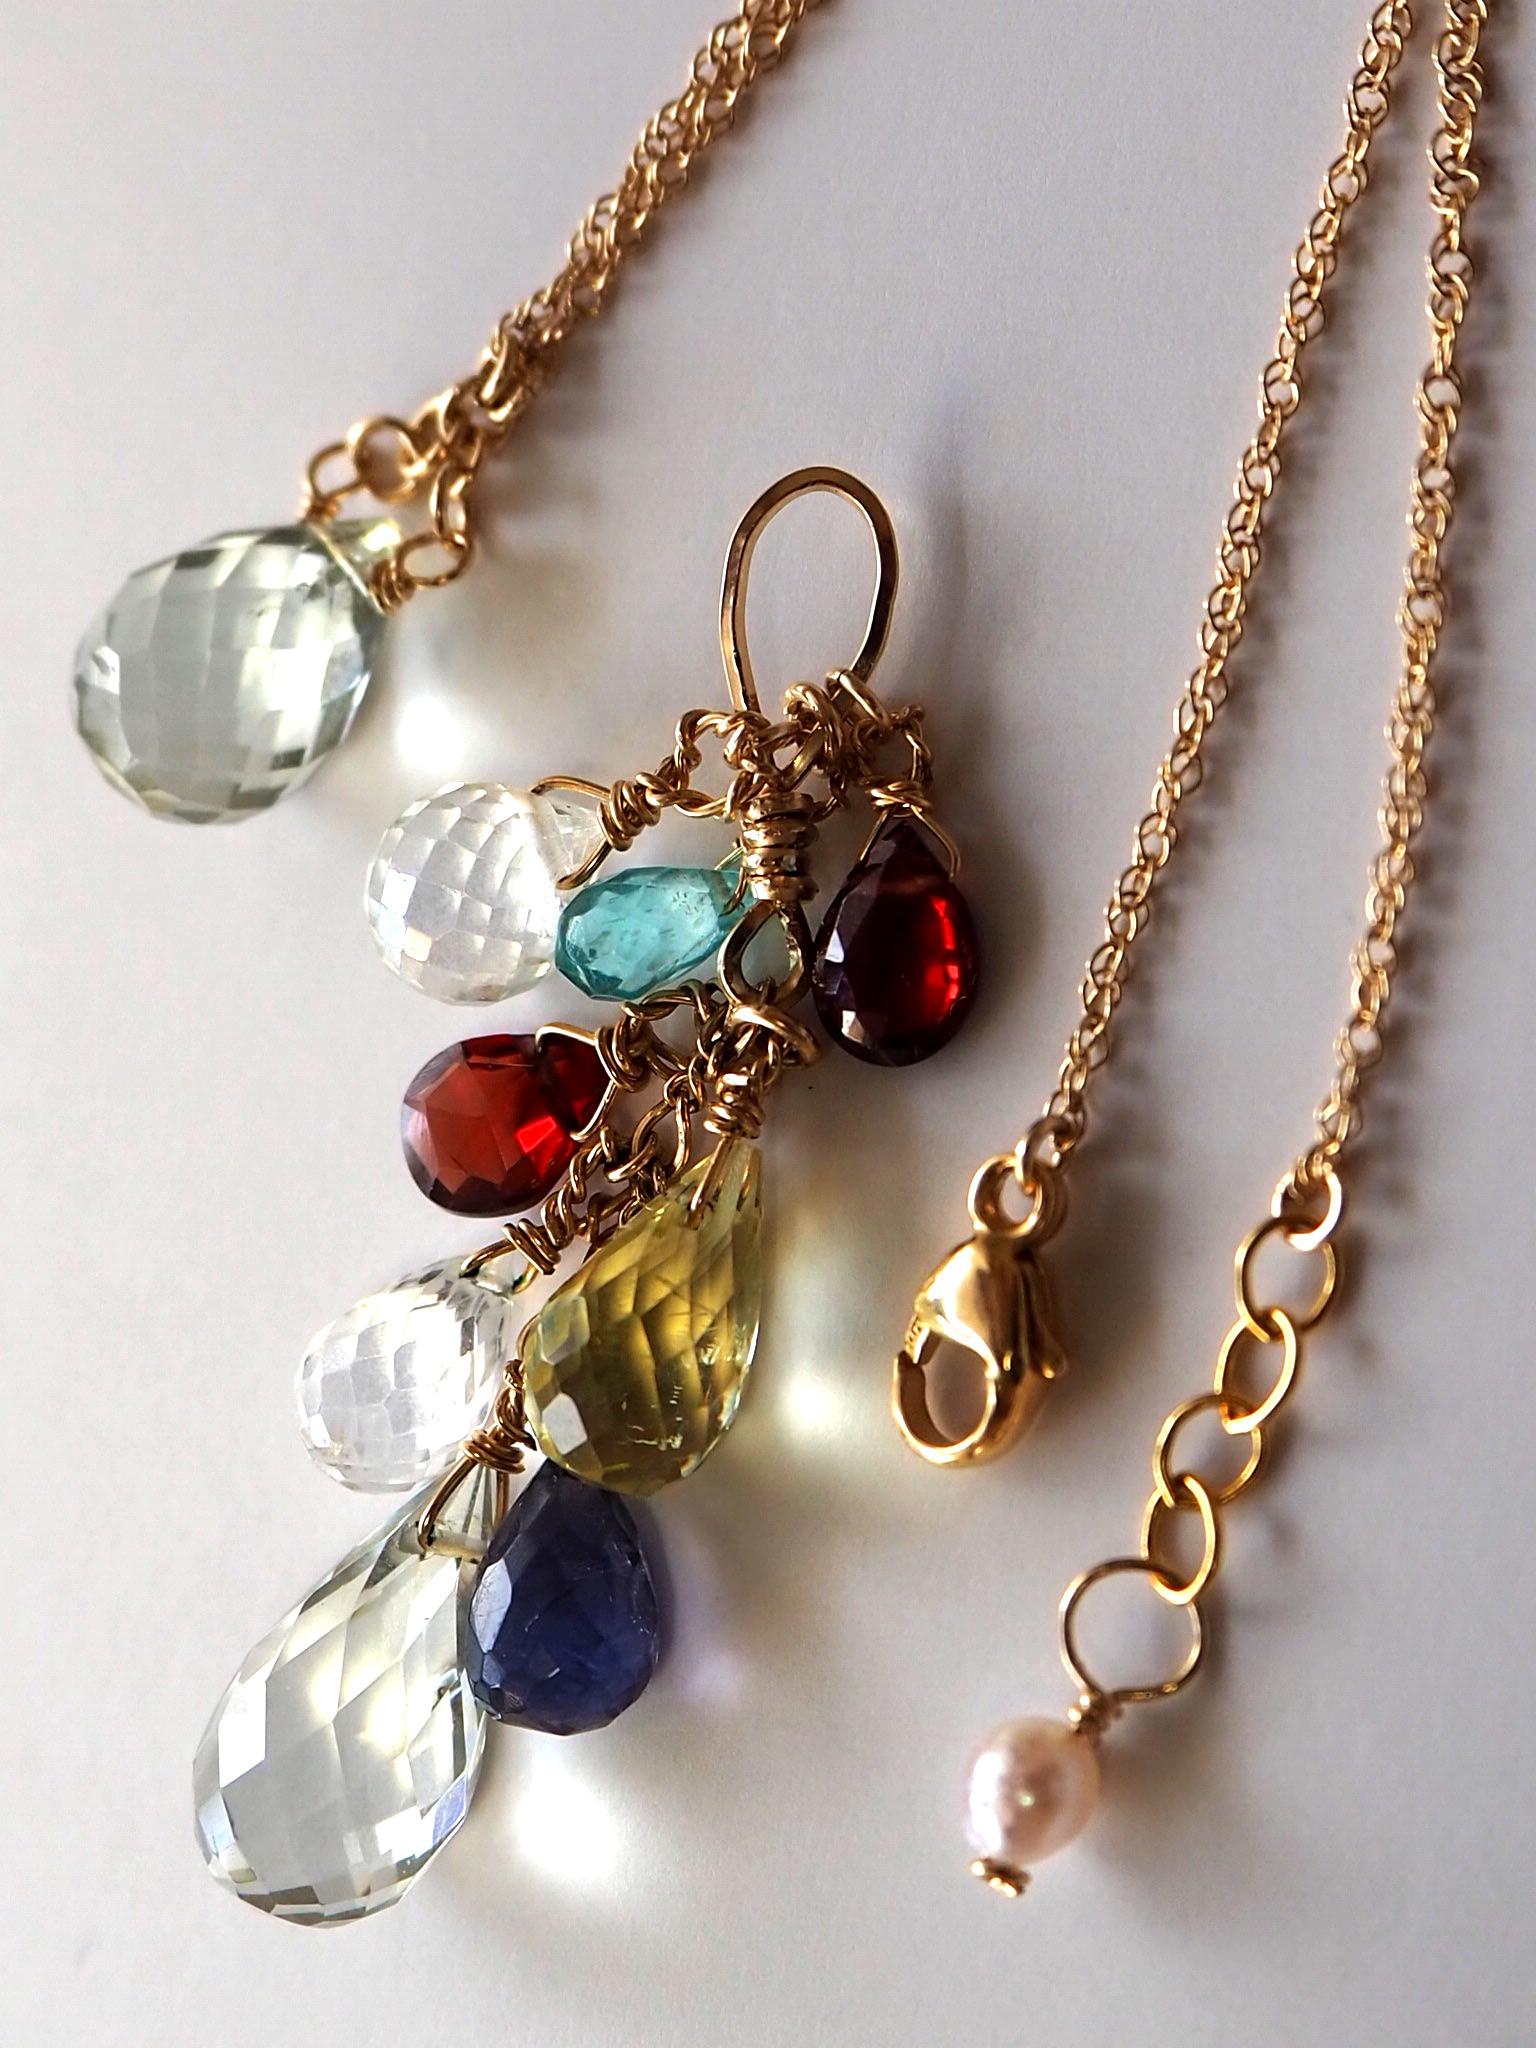 Color stones